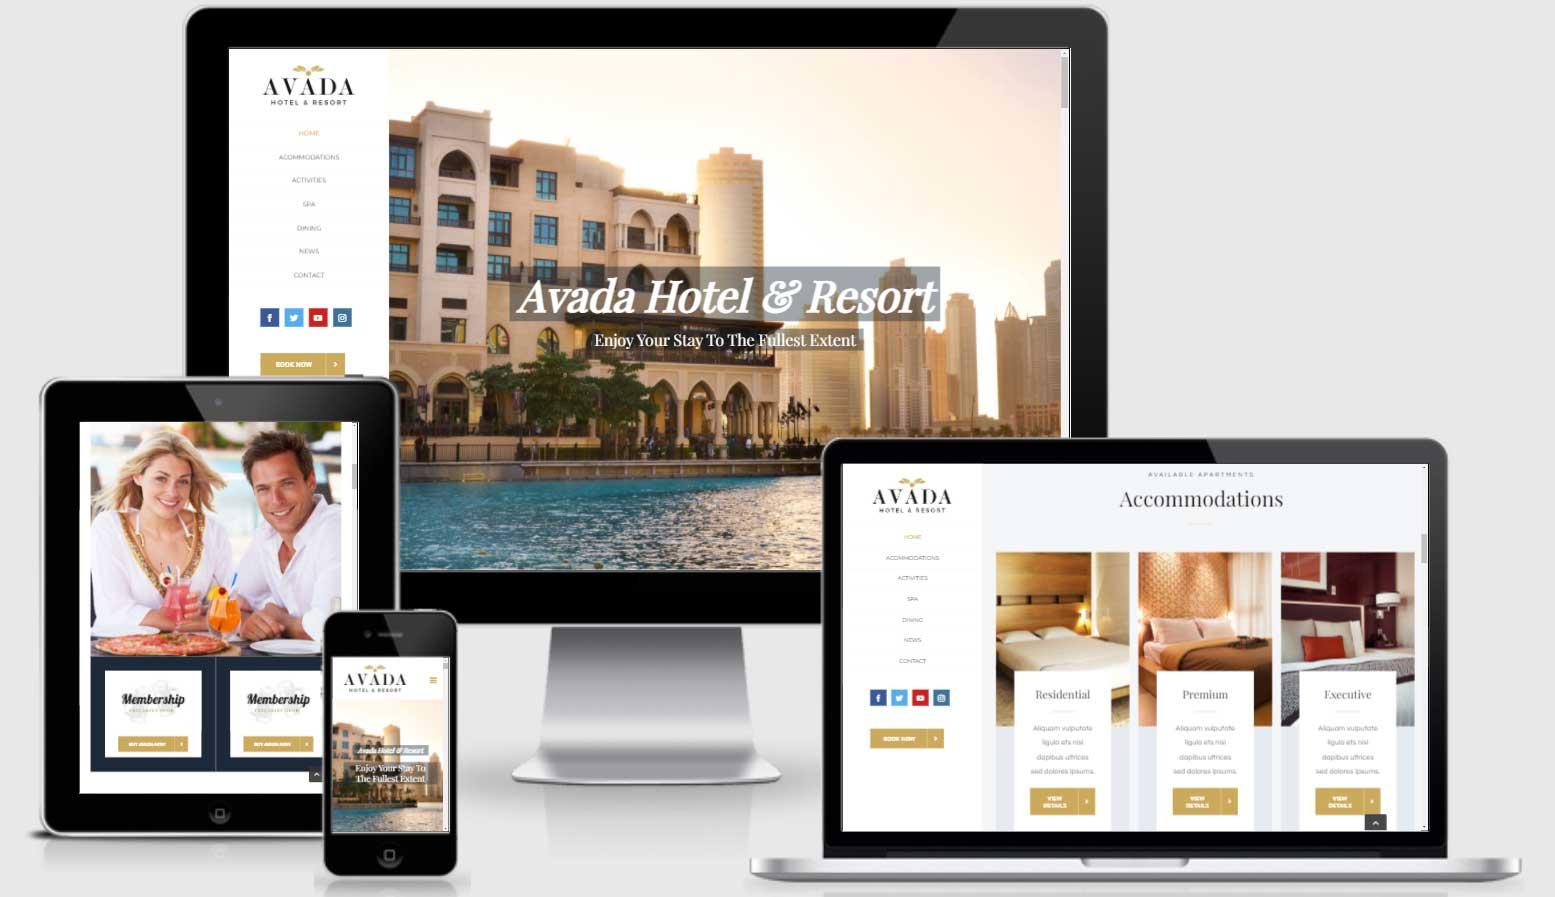 https://khadizachowdhury.com/wp-content/uploads/2021/05/Hotel.jpg